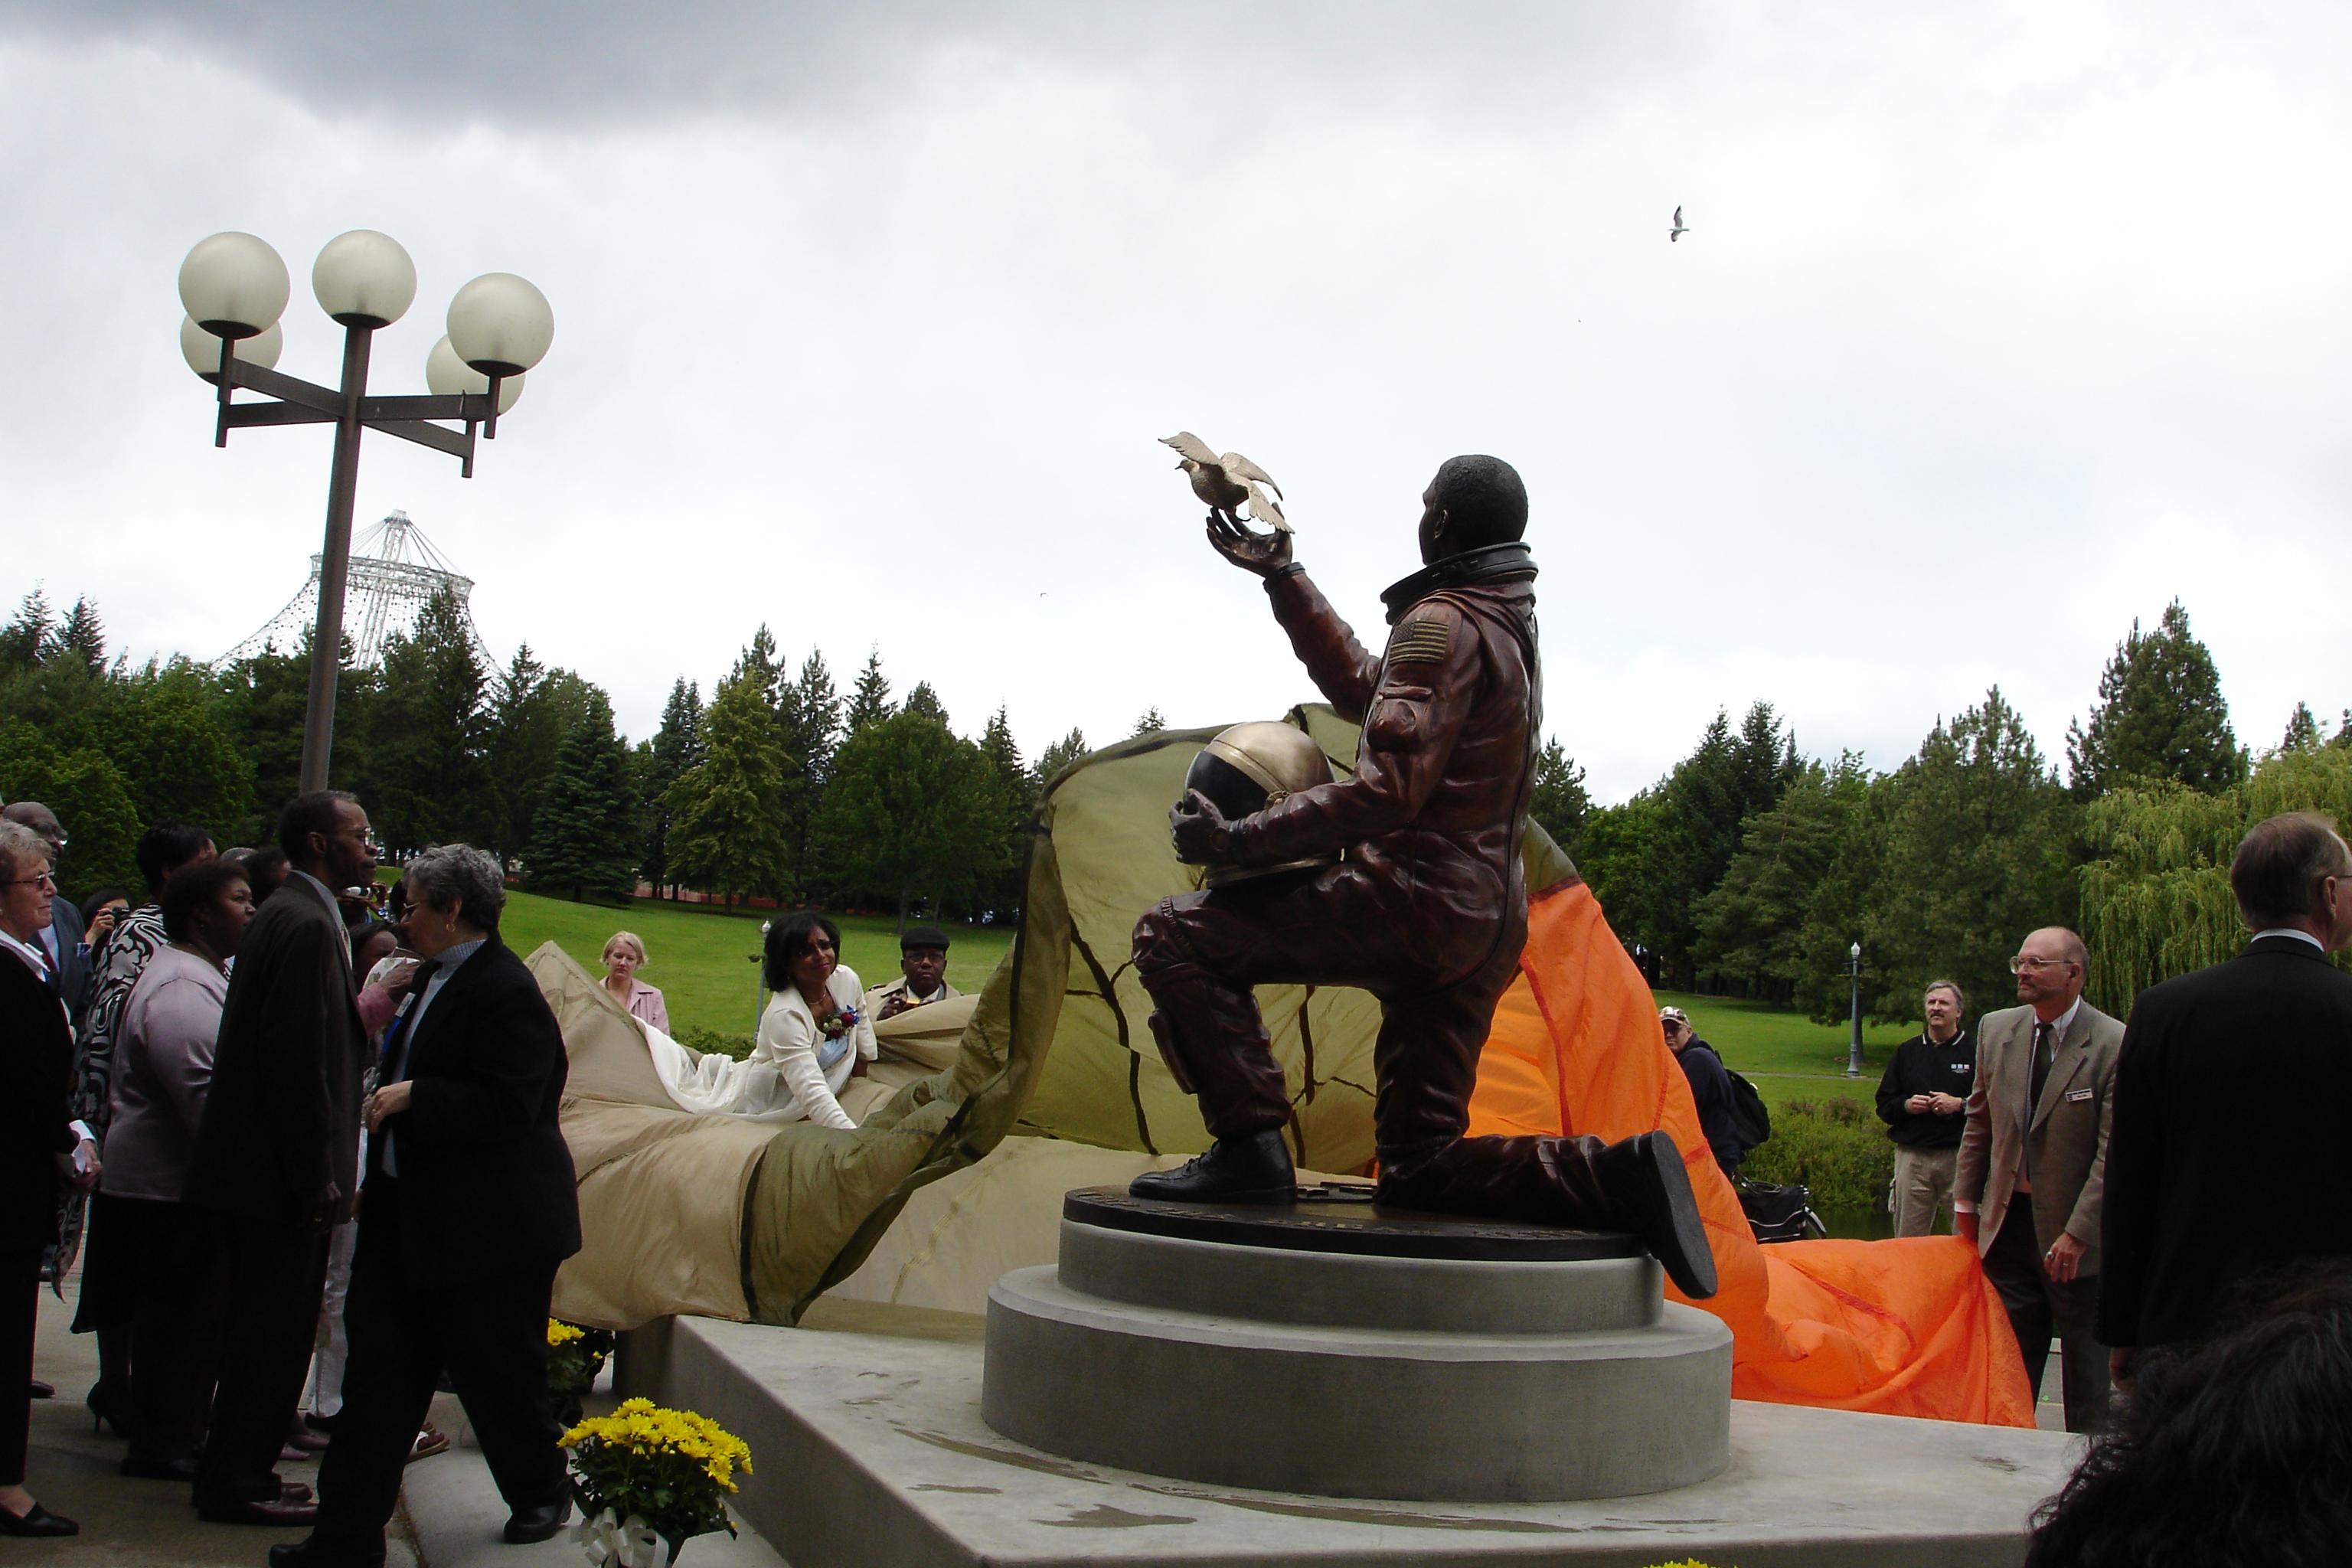 astronaut statue spokane-#9